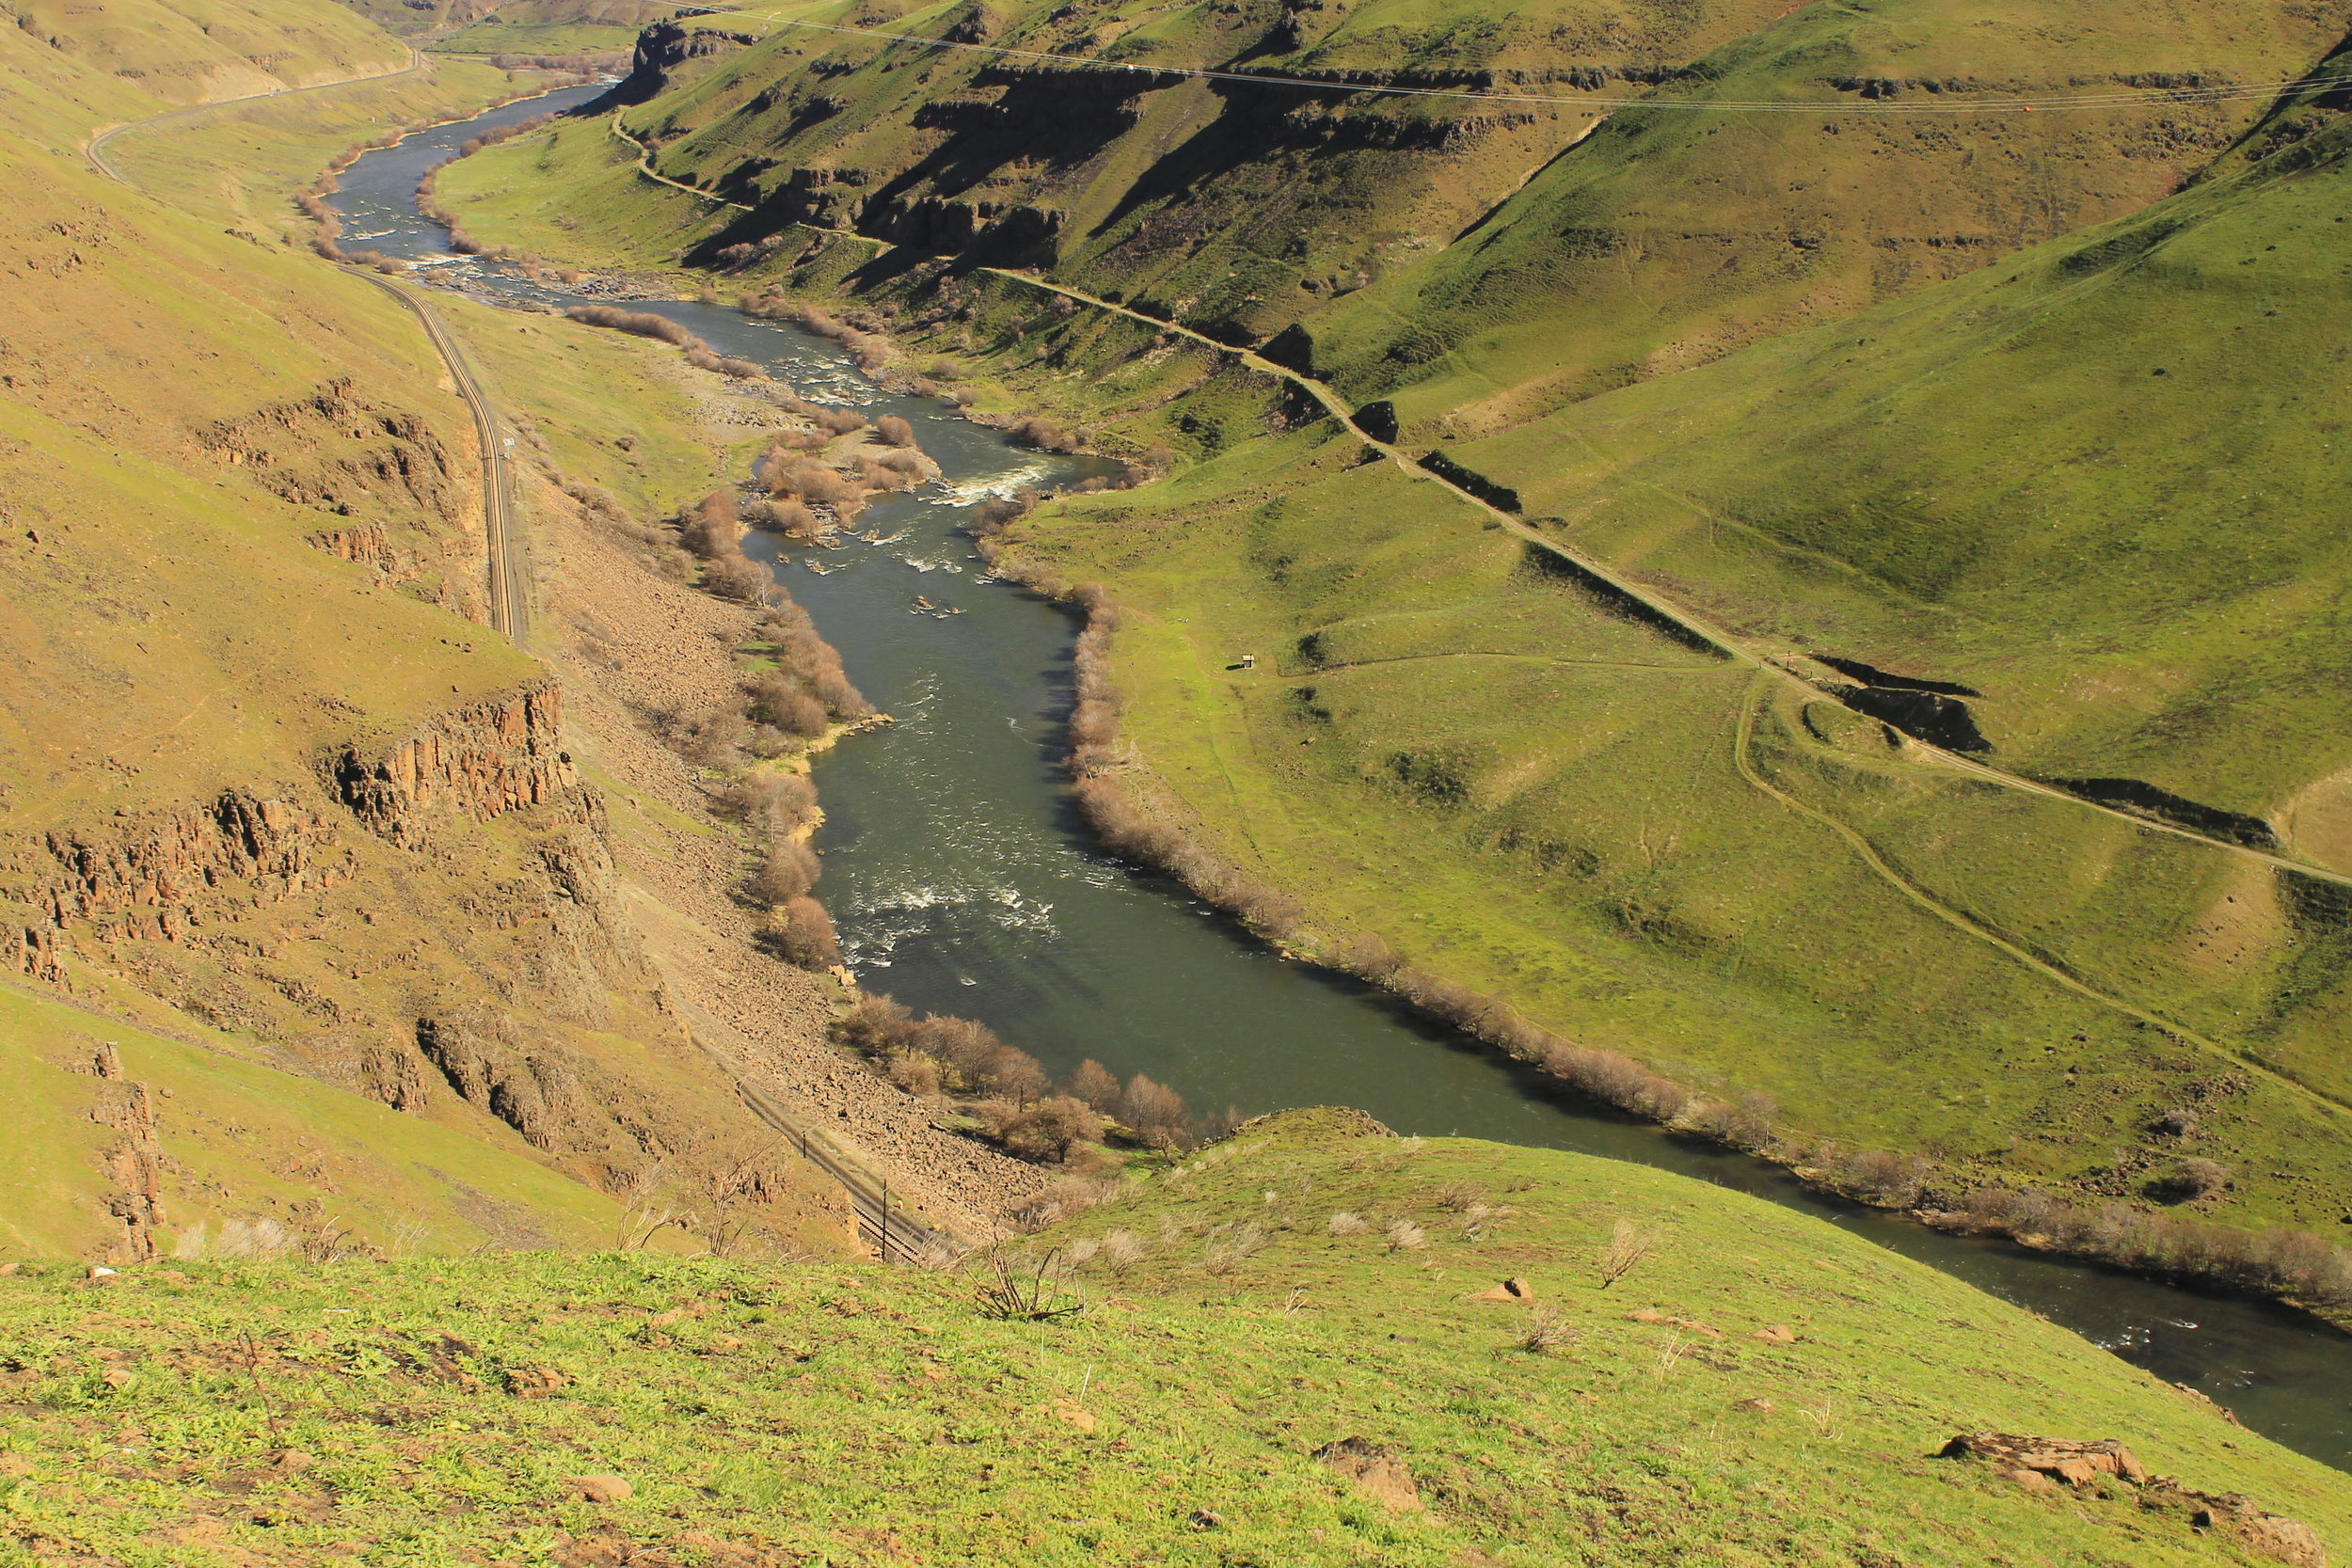 The Deschutes River from Free Bridge Road